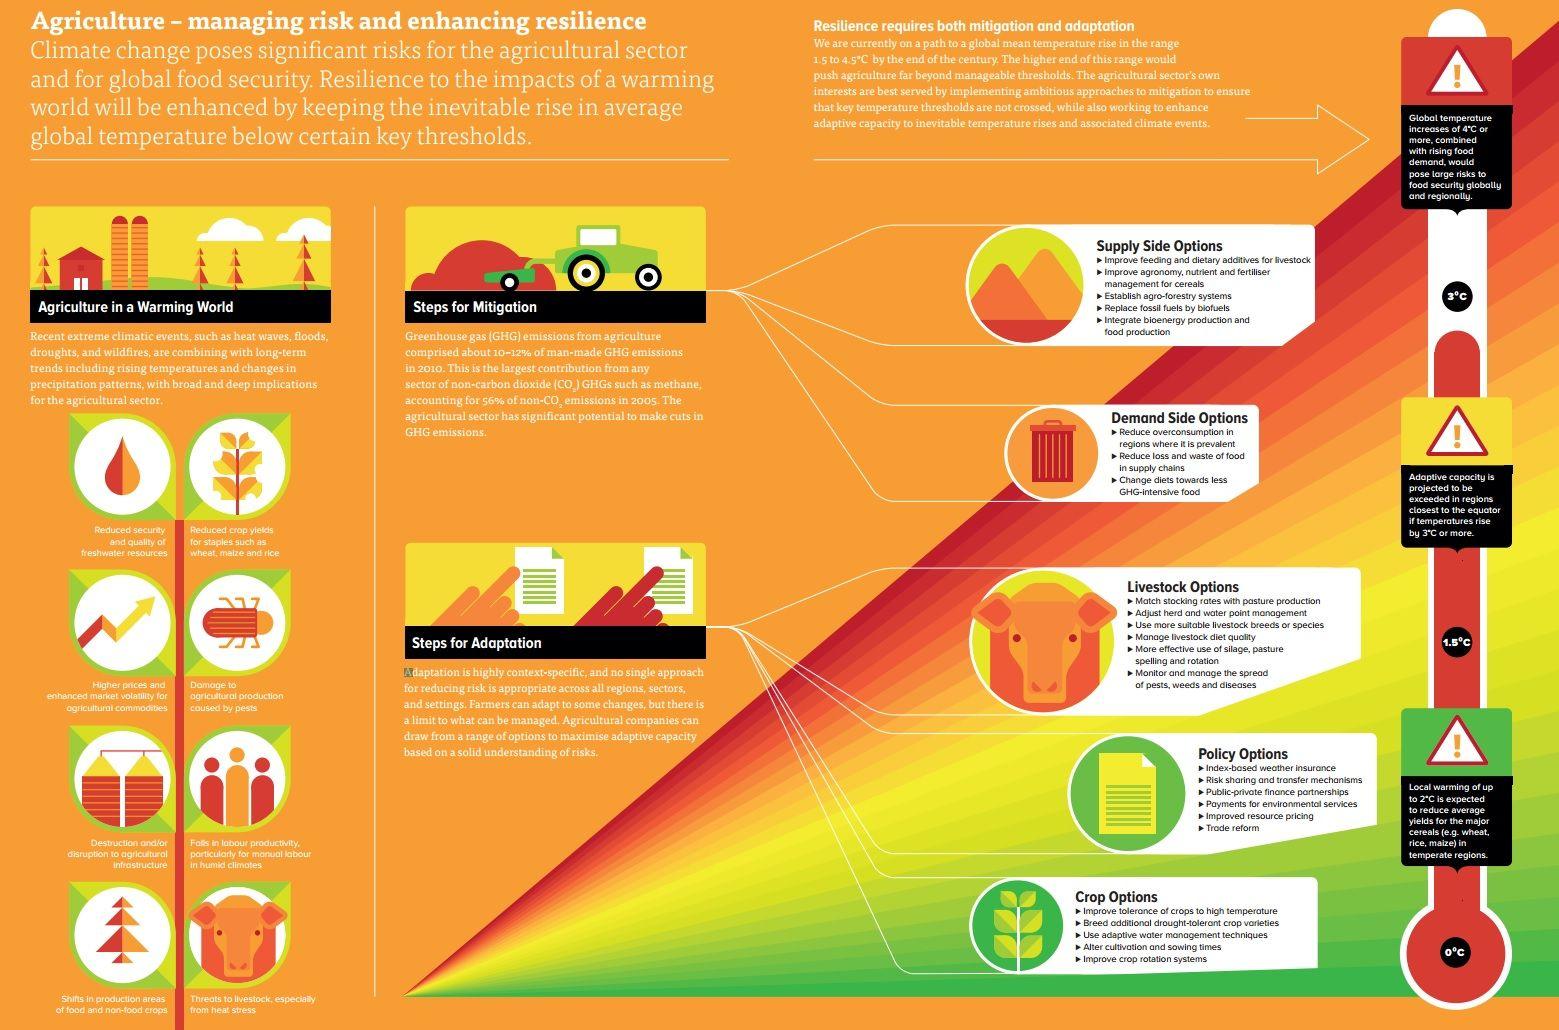 ipcc 5th assessment report pdf